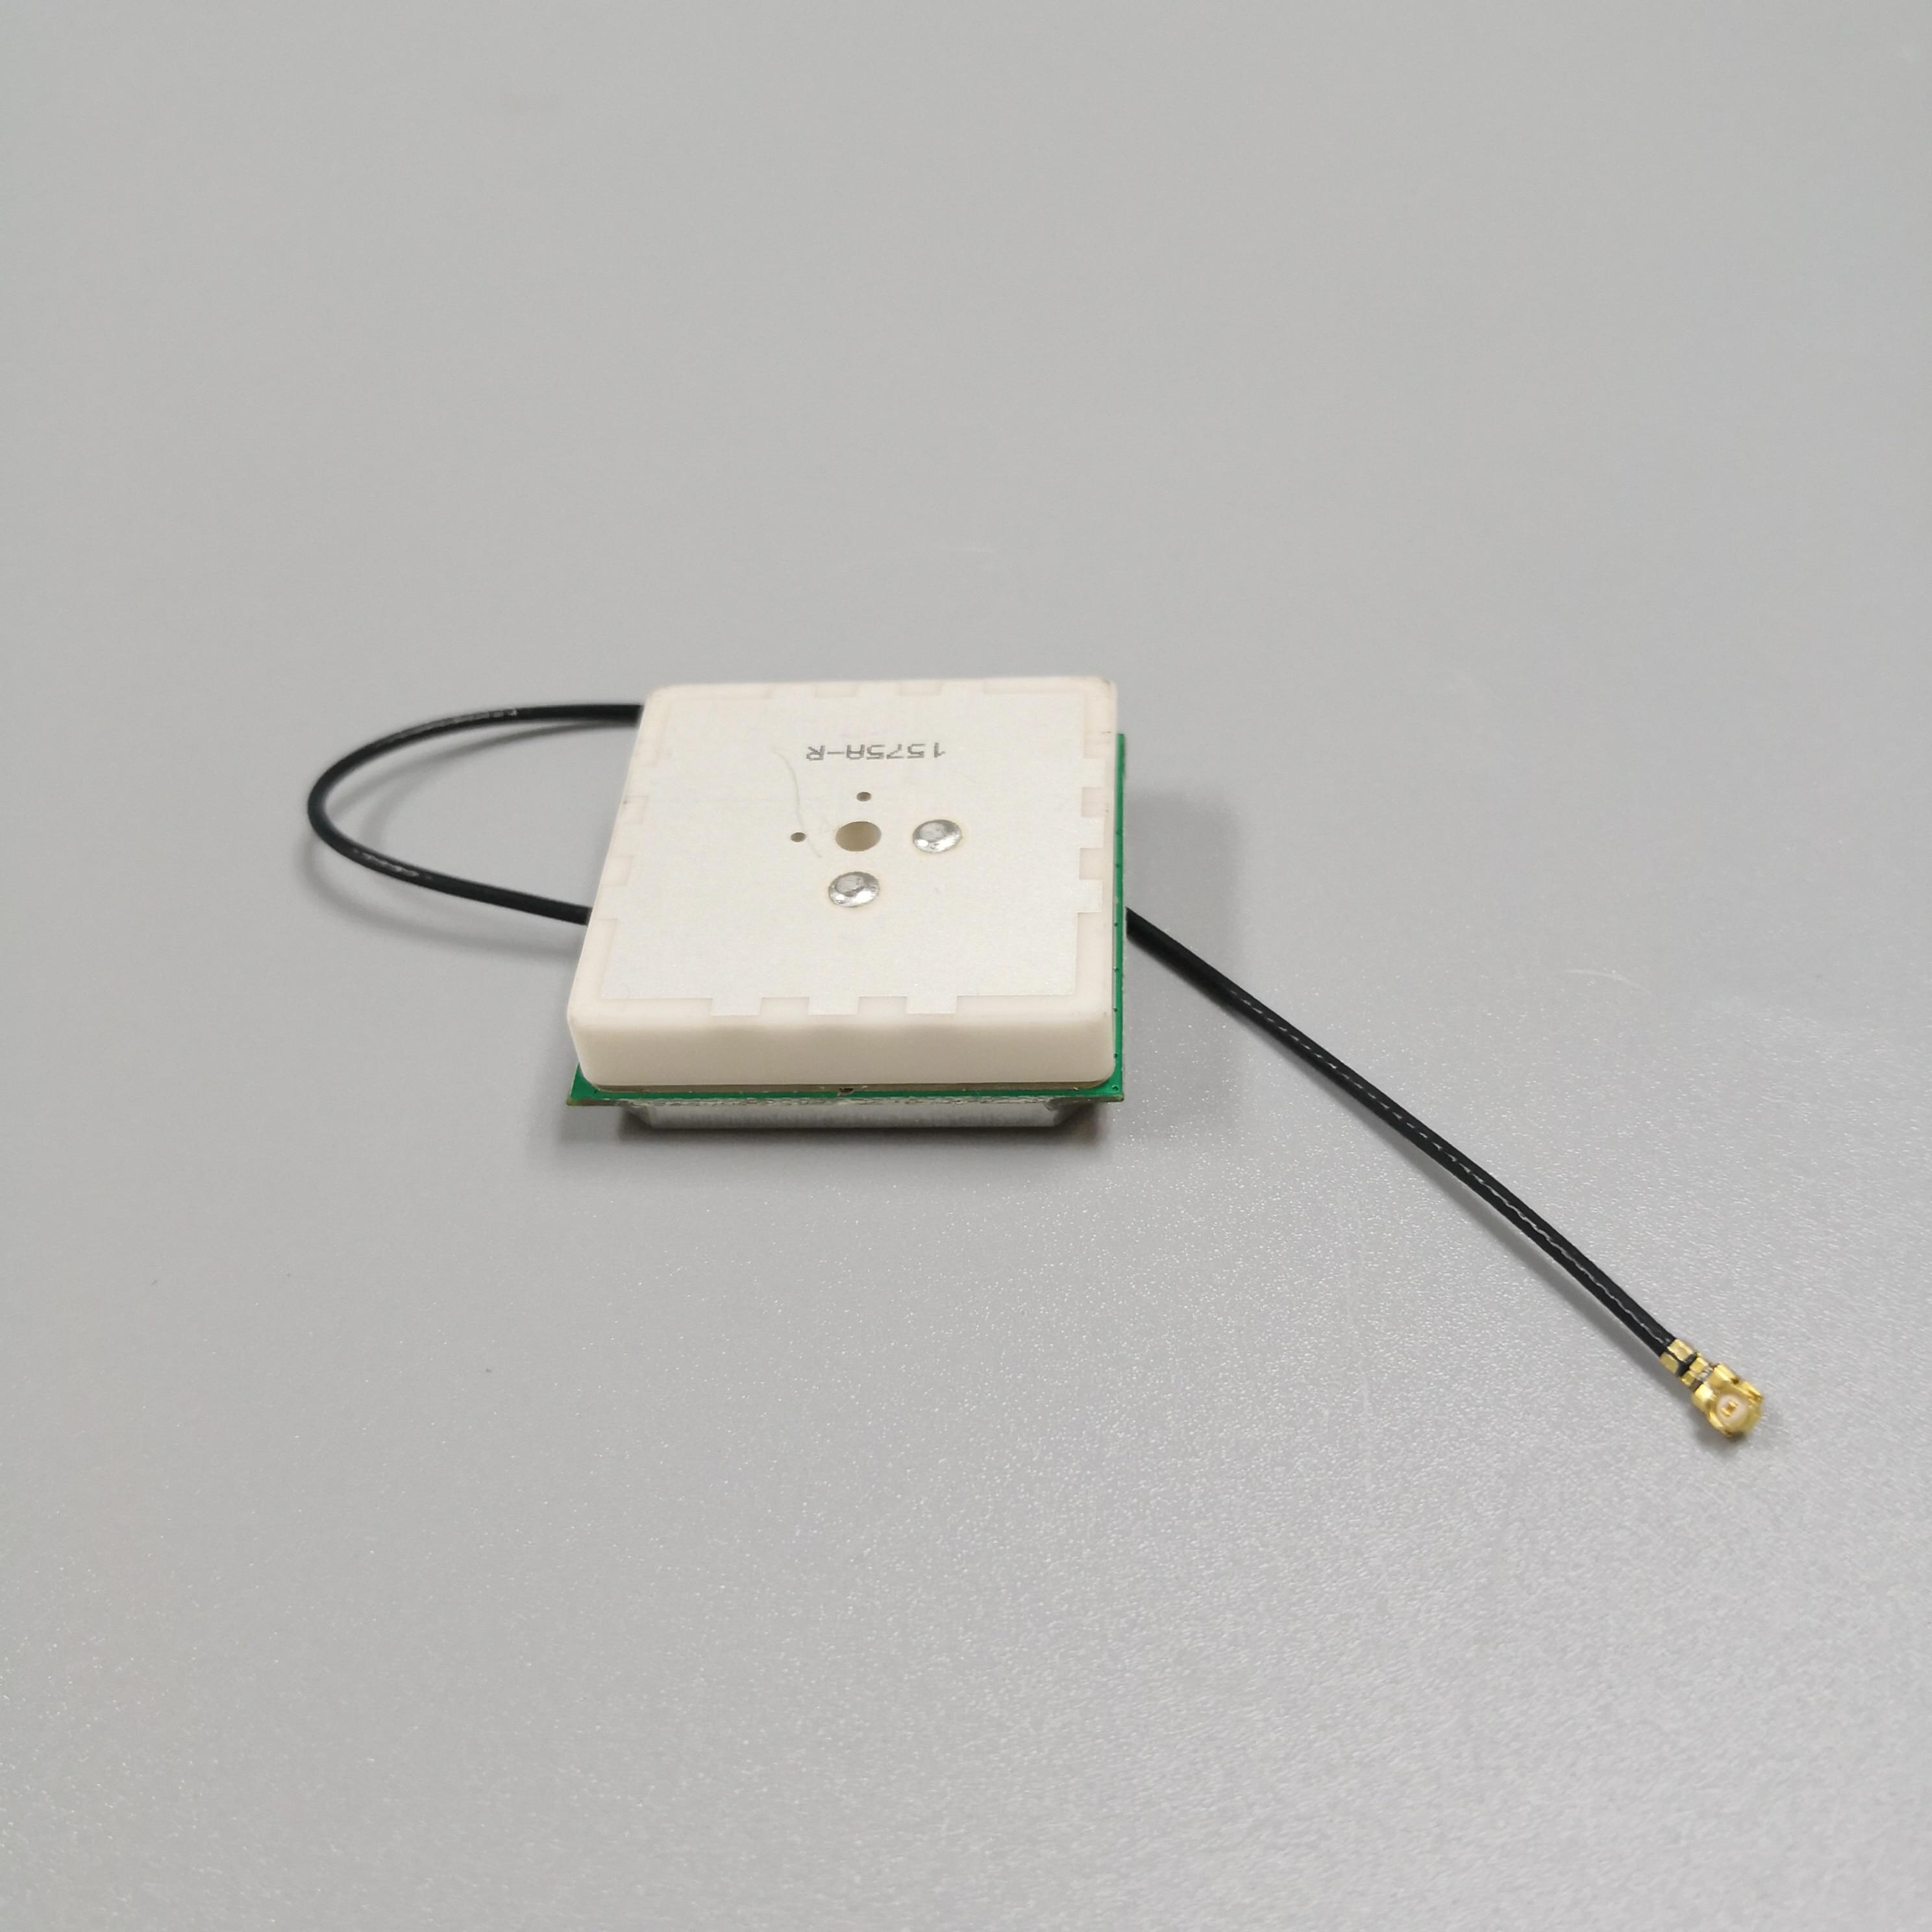 RTK High-quality GPS Antenna 38DB High-gain High-precision Positioning GNSS Antenna,GPS GLONASS, BEI DOU Three System